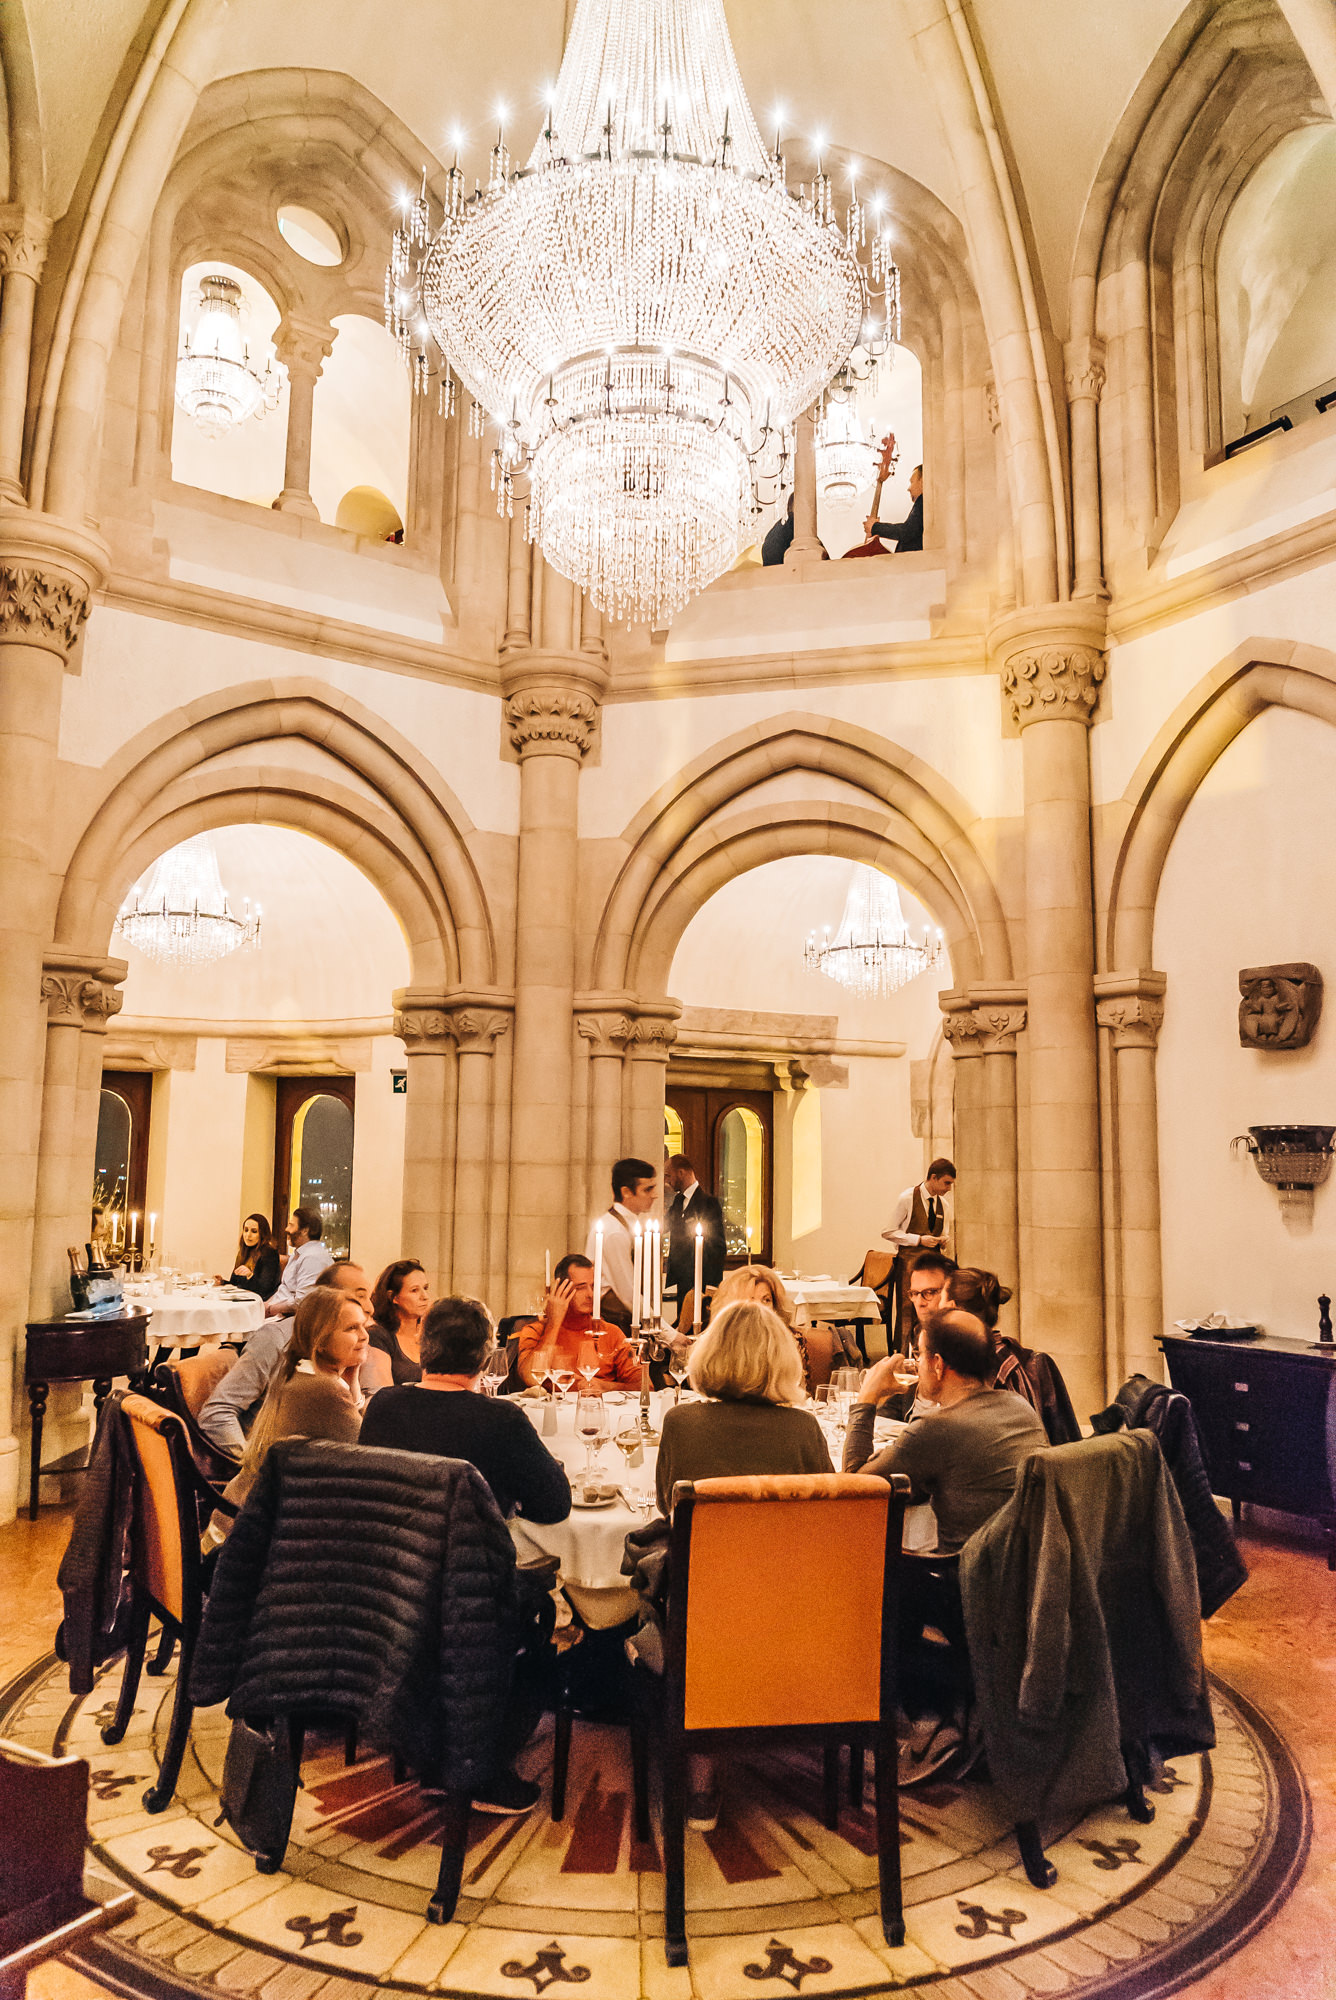 Gorgeous decor inside Halaszbastya Restaurant